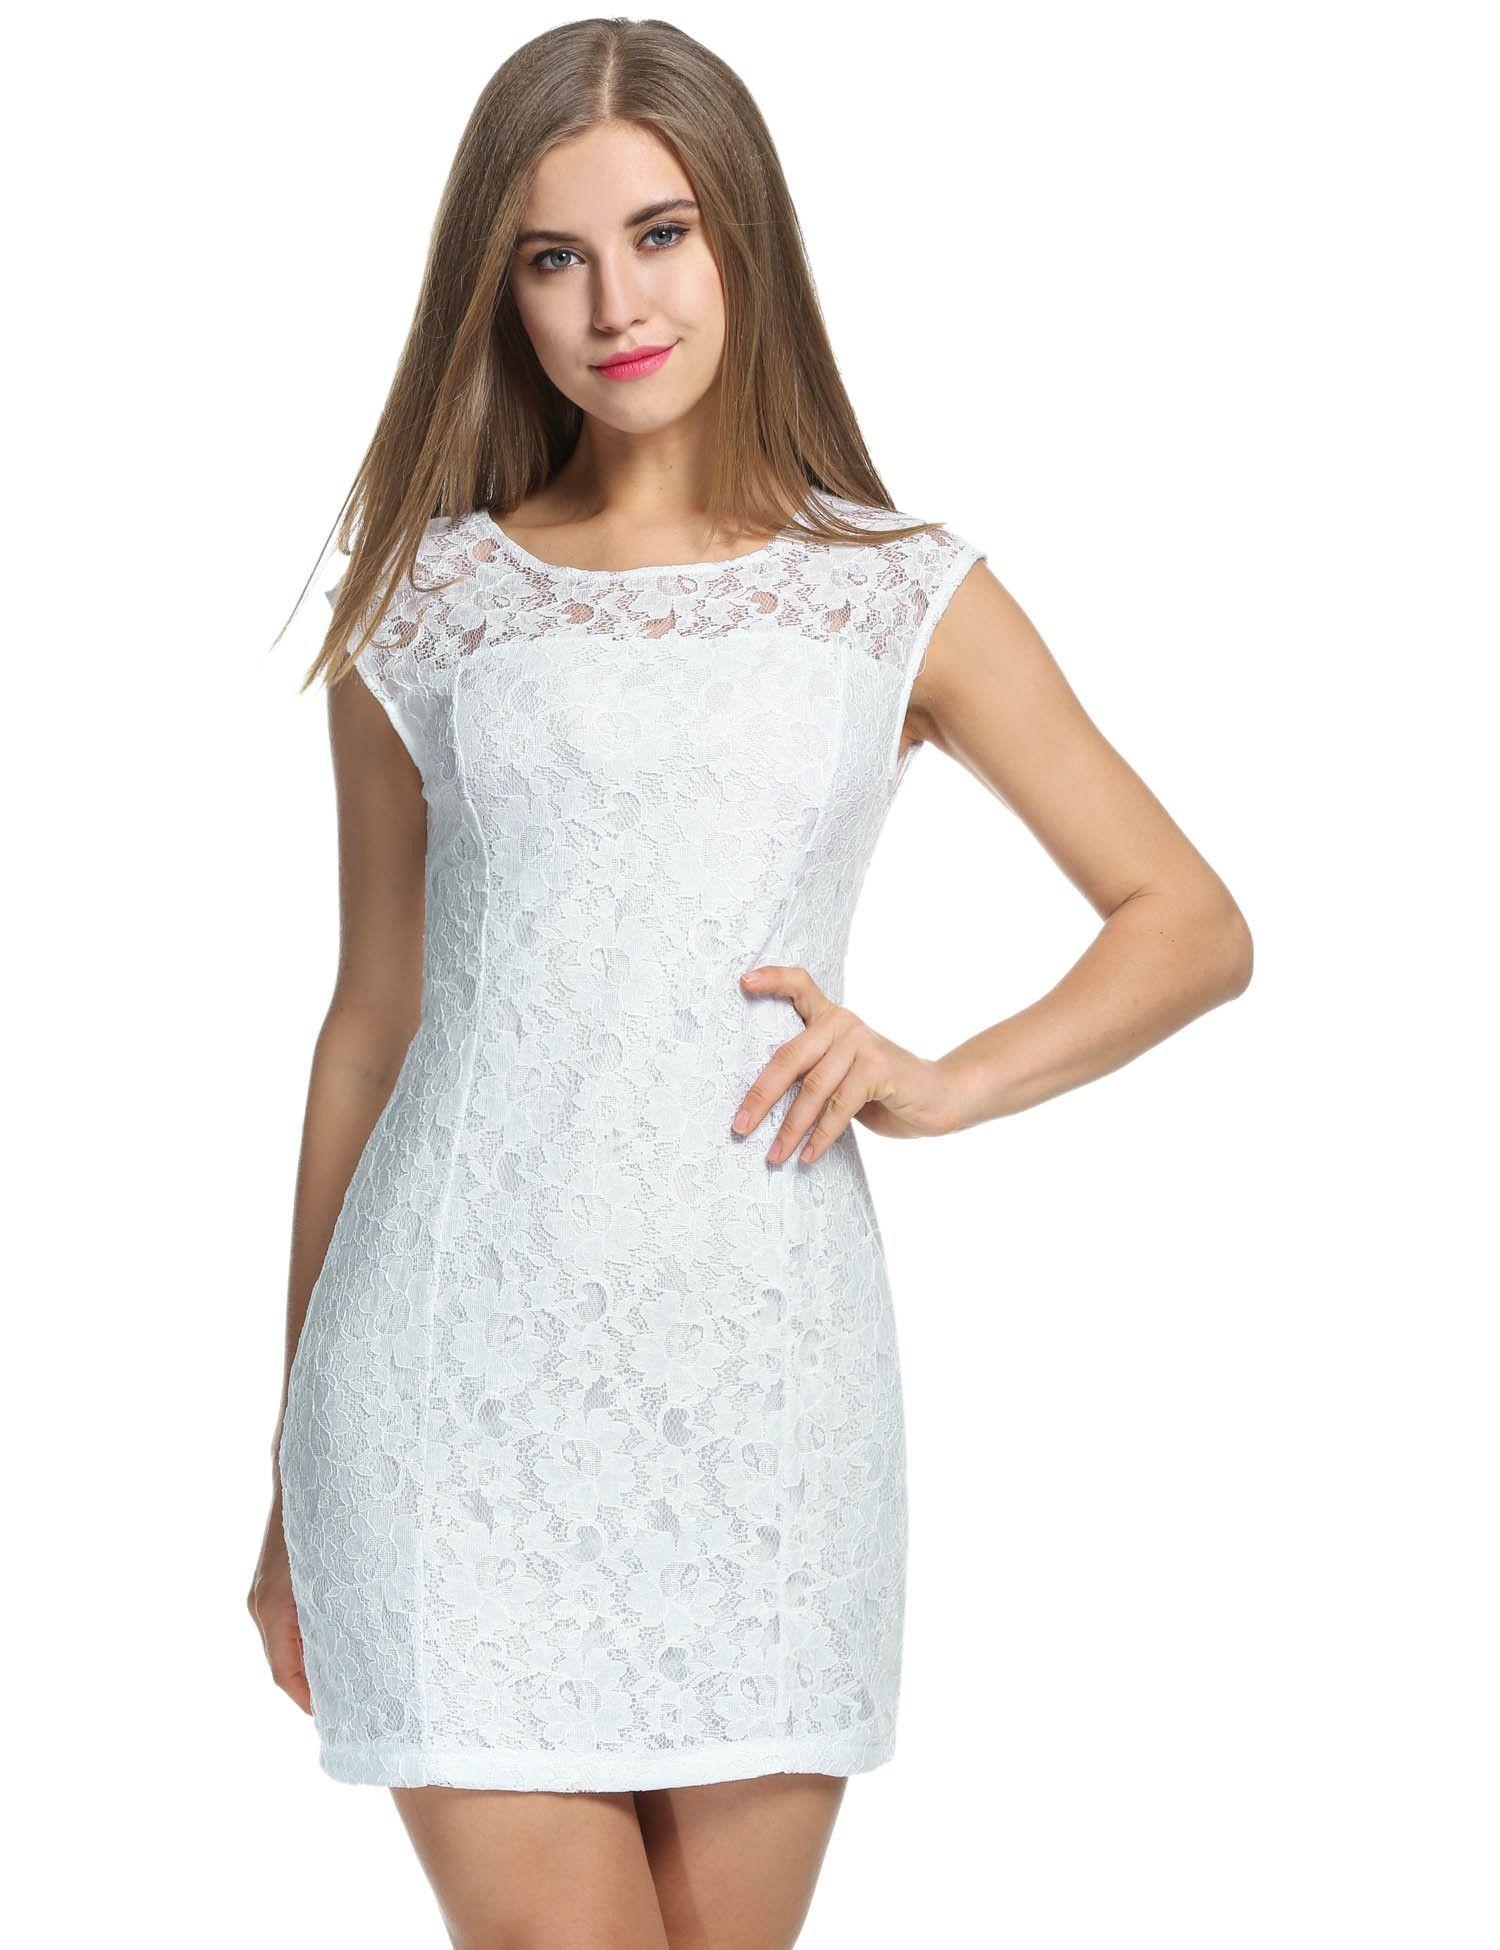 3fdf703004e43 Sleeveless Lace Bodycon Party Cocktail Party Dress | women's fashion ...